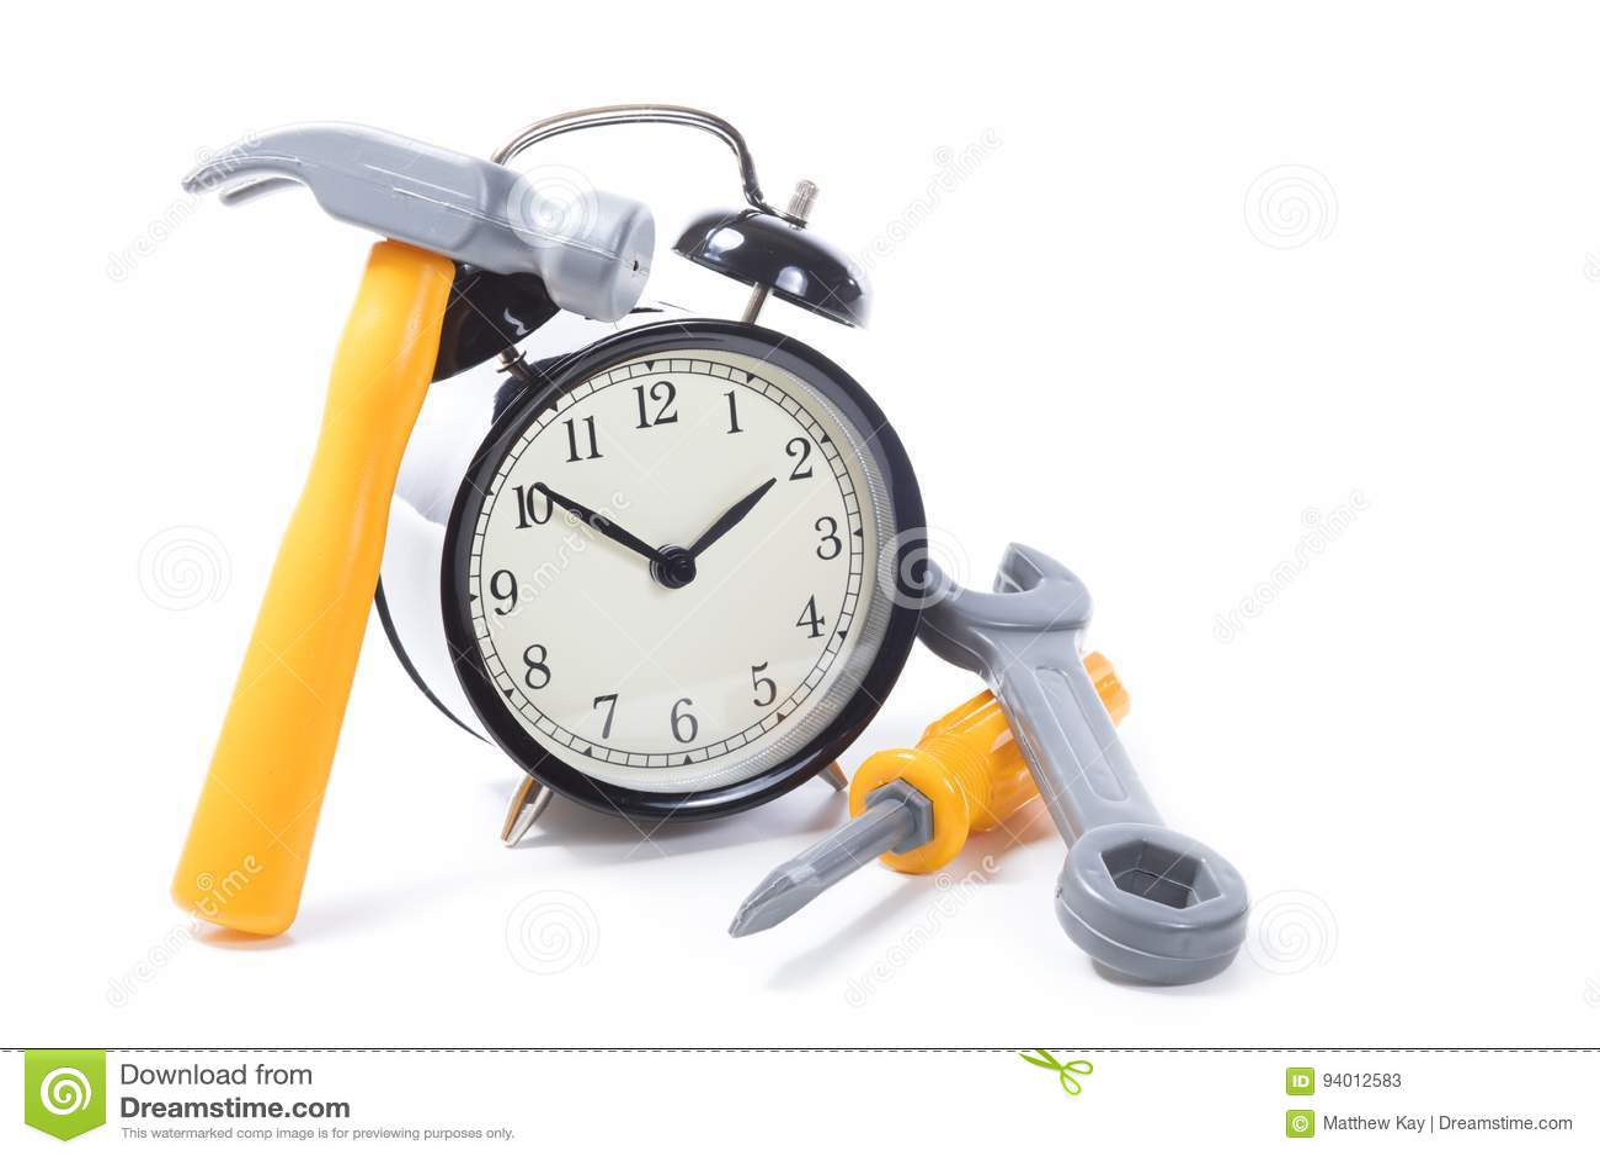 Round Retro Alarm Clock With Tools Stock Image - Image of